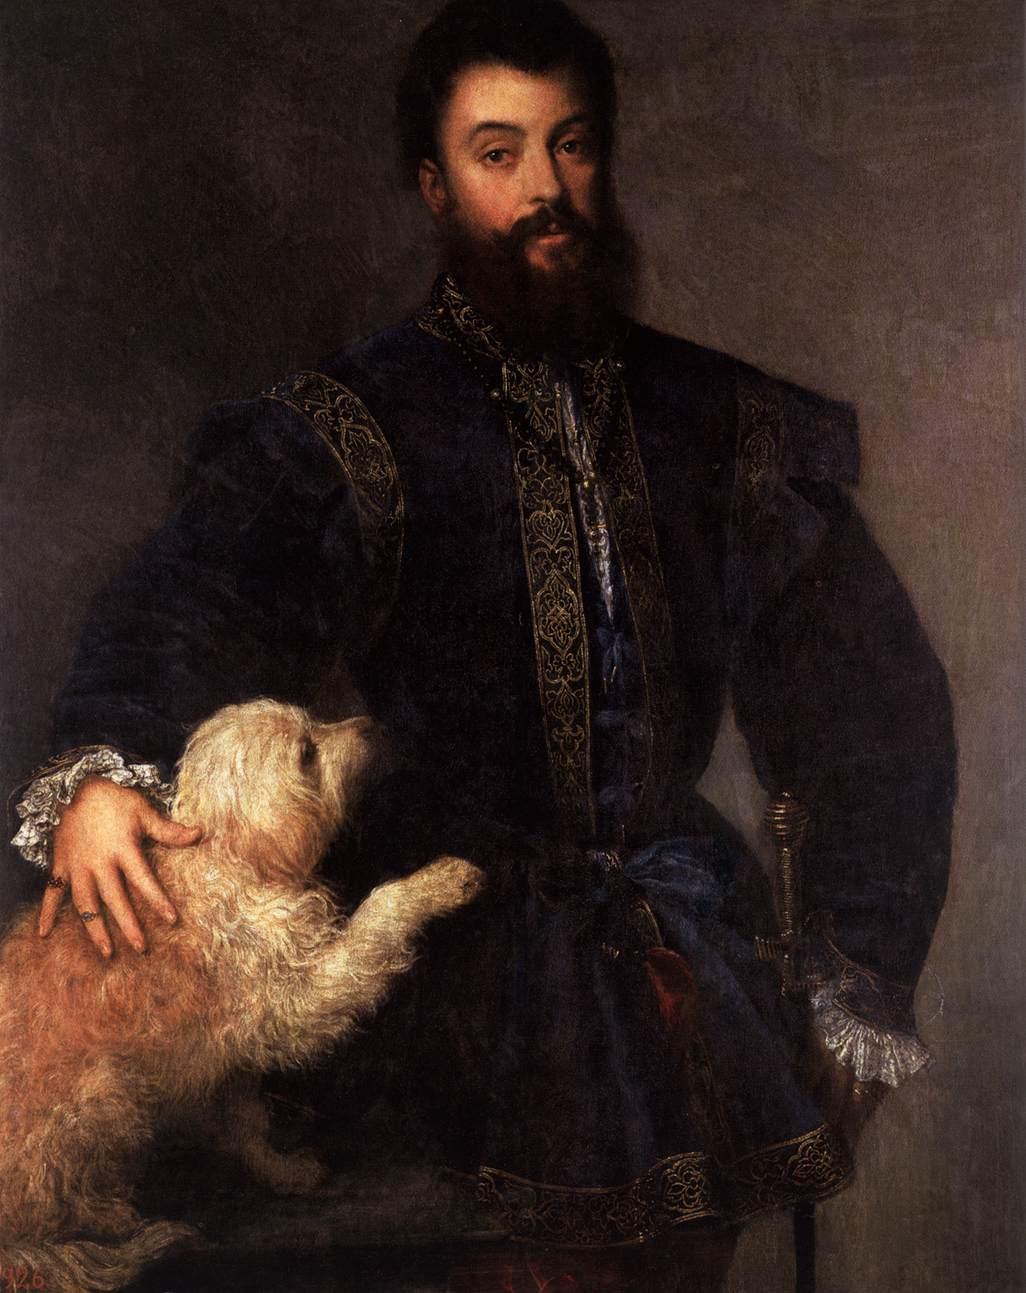 Тициан. Портрет Федерико II Гонзага, герцога мантуанского. 1529